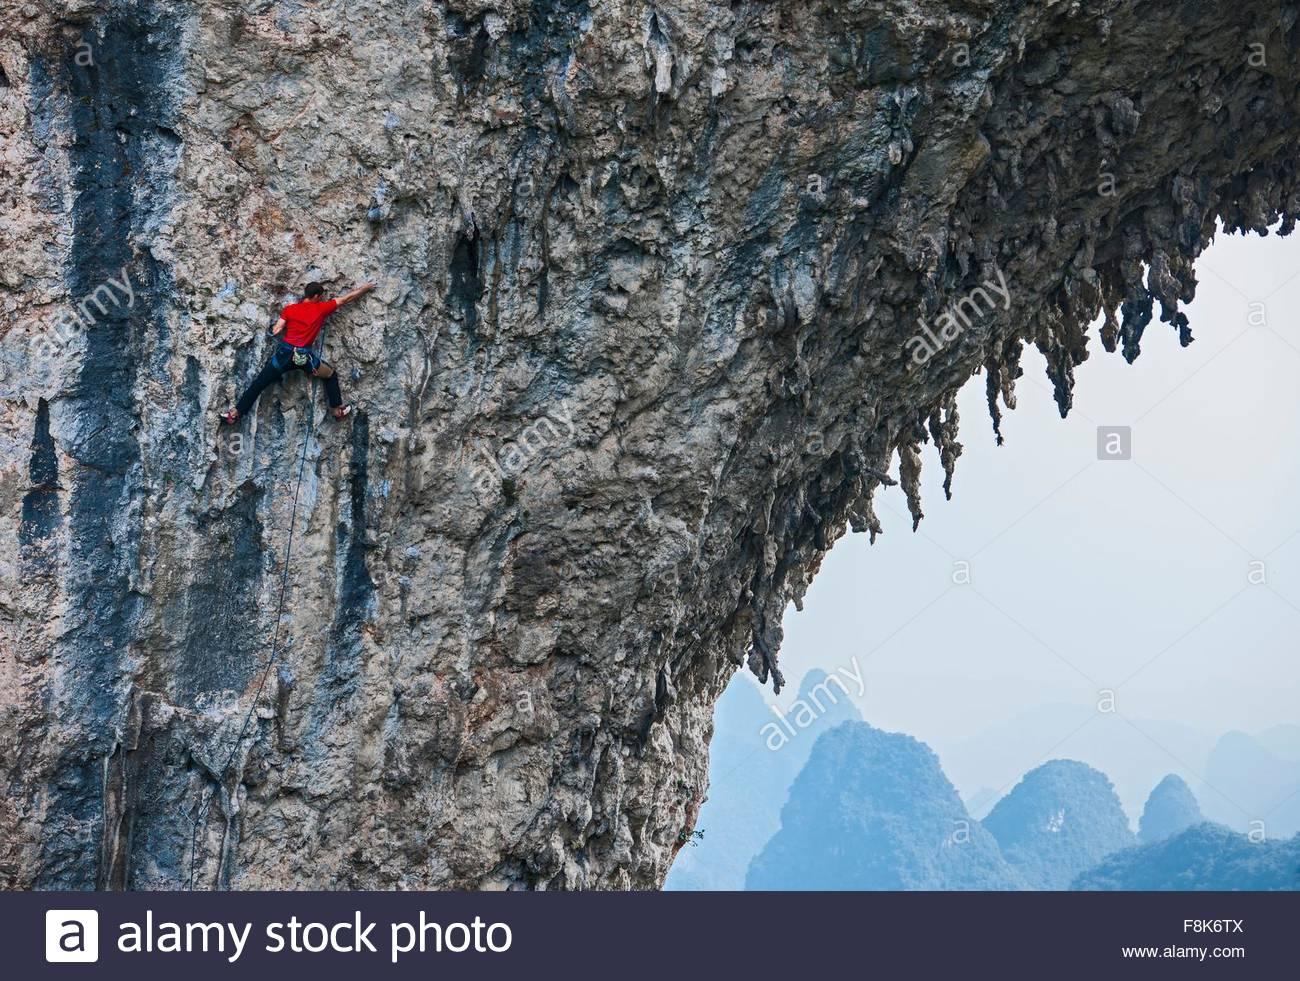 Escalada escalador masculino de Moon Hill - un acantilado de piedra caliza en Yangshuo, Guangxi Zhuang, China Imagen De Stock